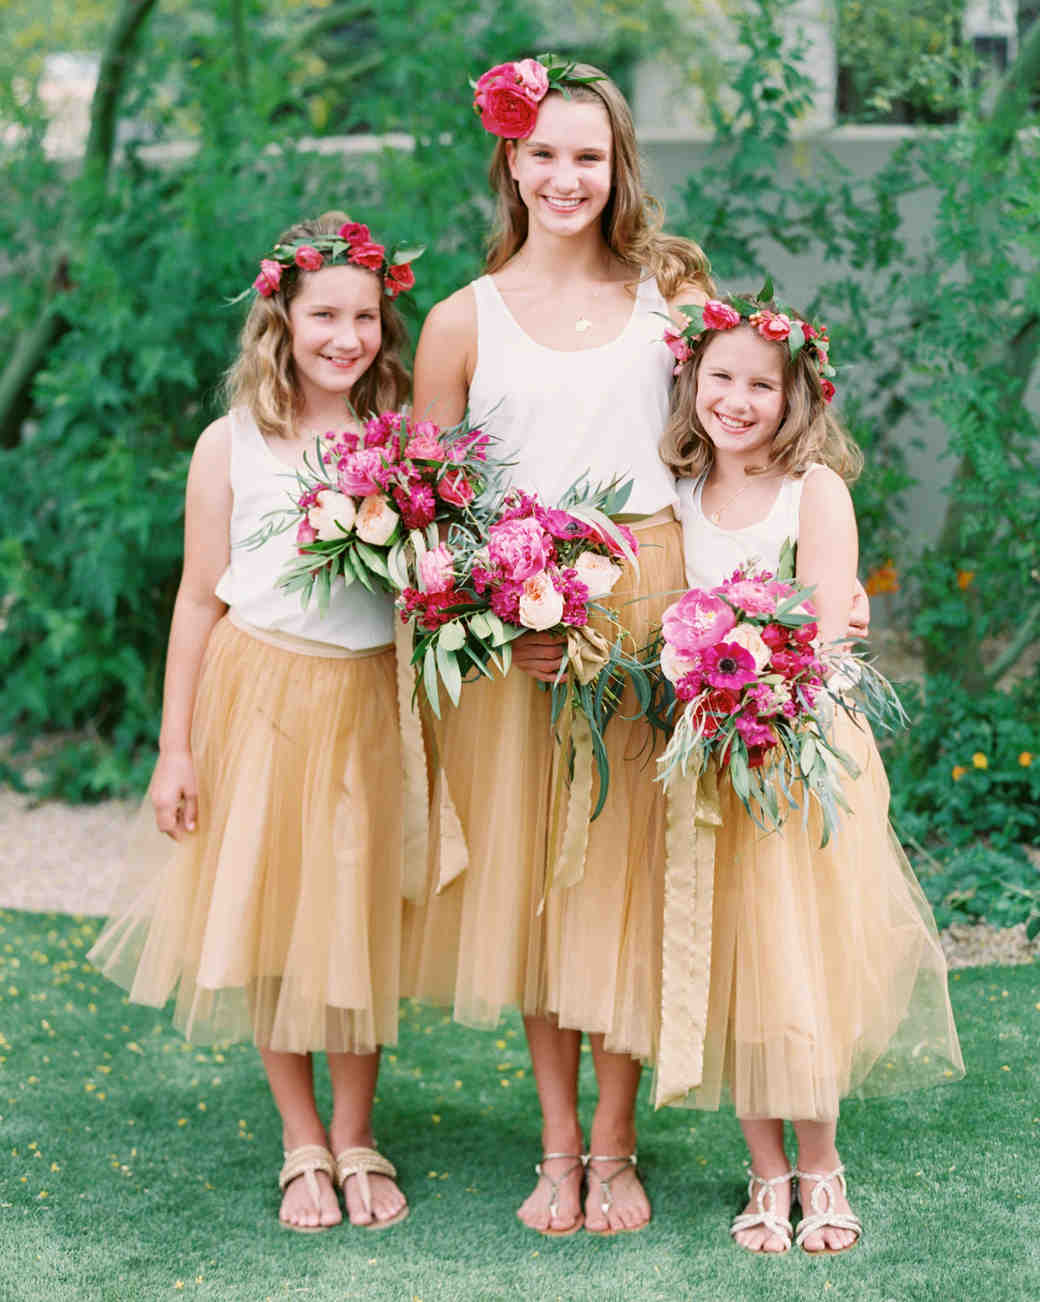 jessejo-daniel-wedding-flowergirls-113-s112302-1015.jpg